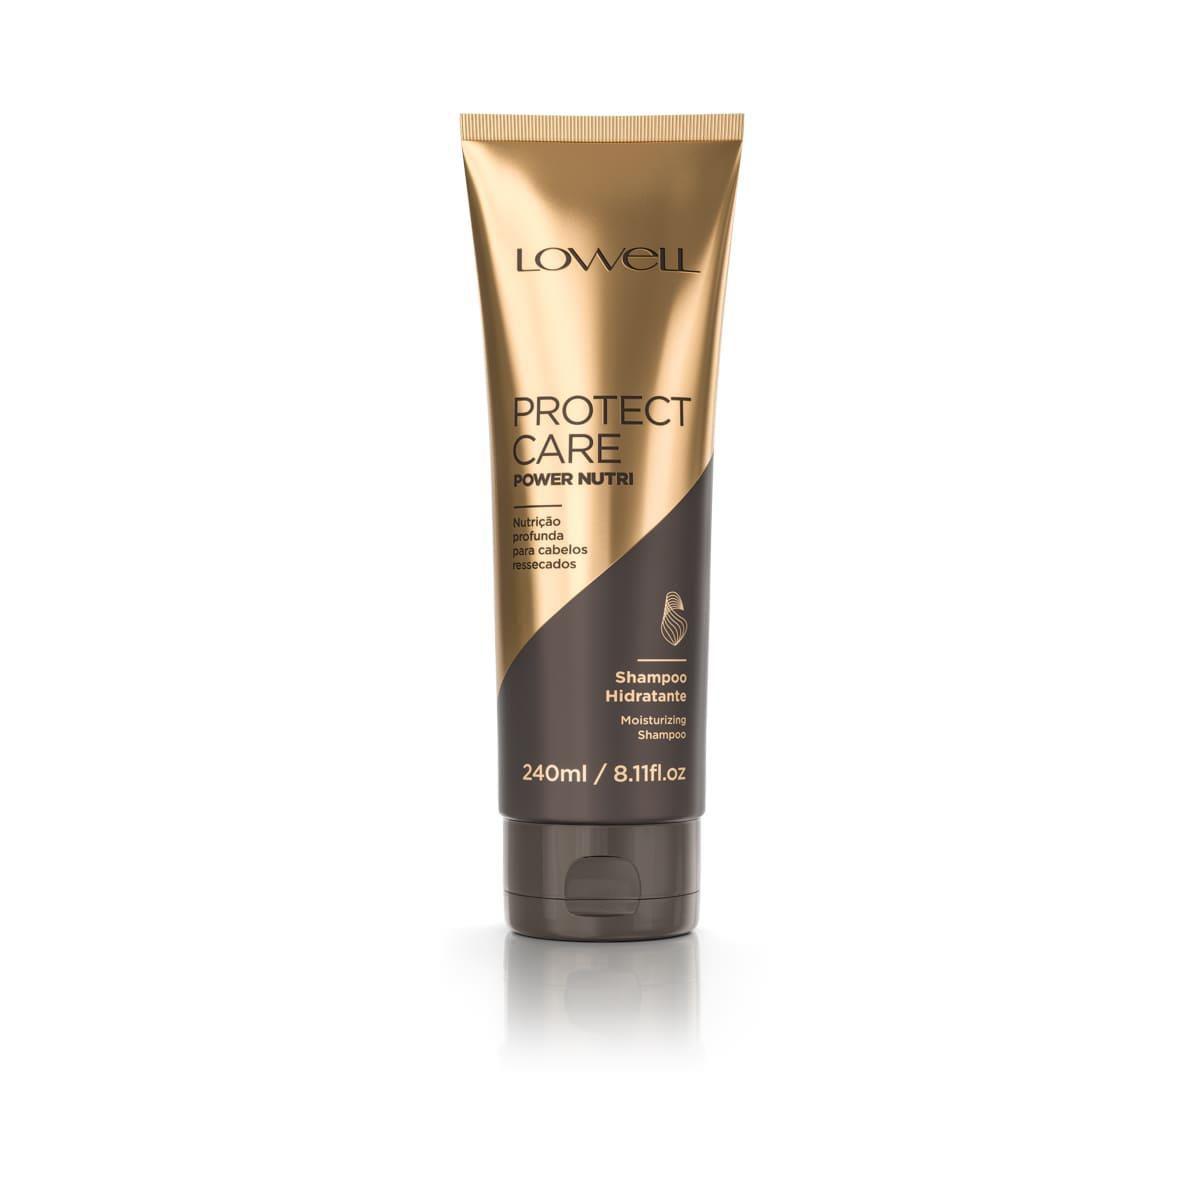 Shampoo Protect Care Power Nutri 240ml